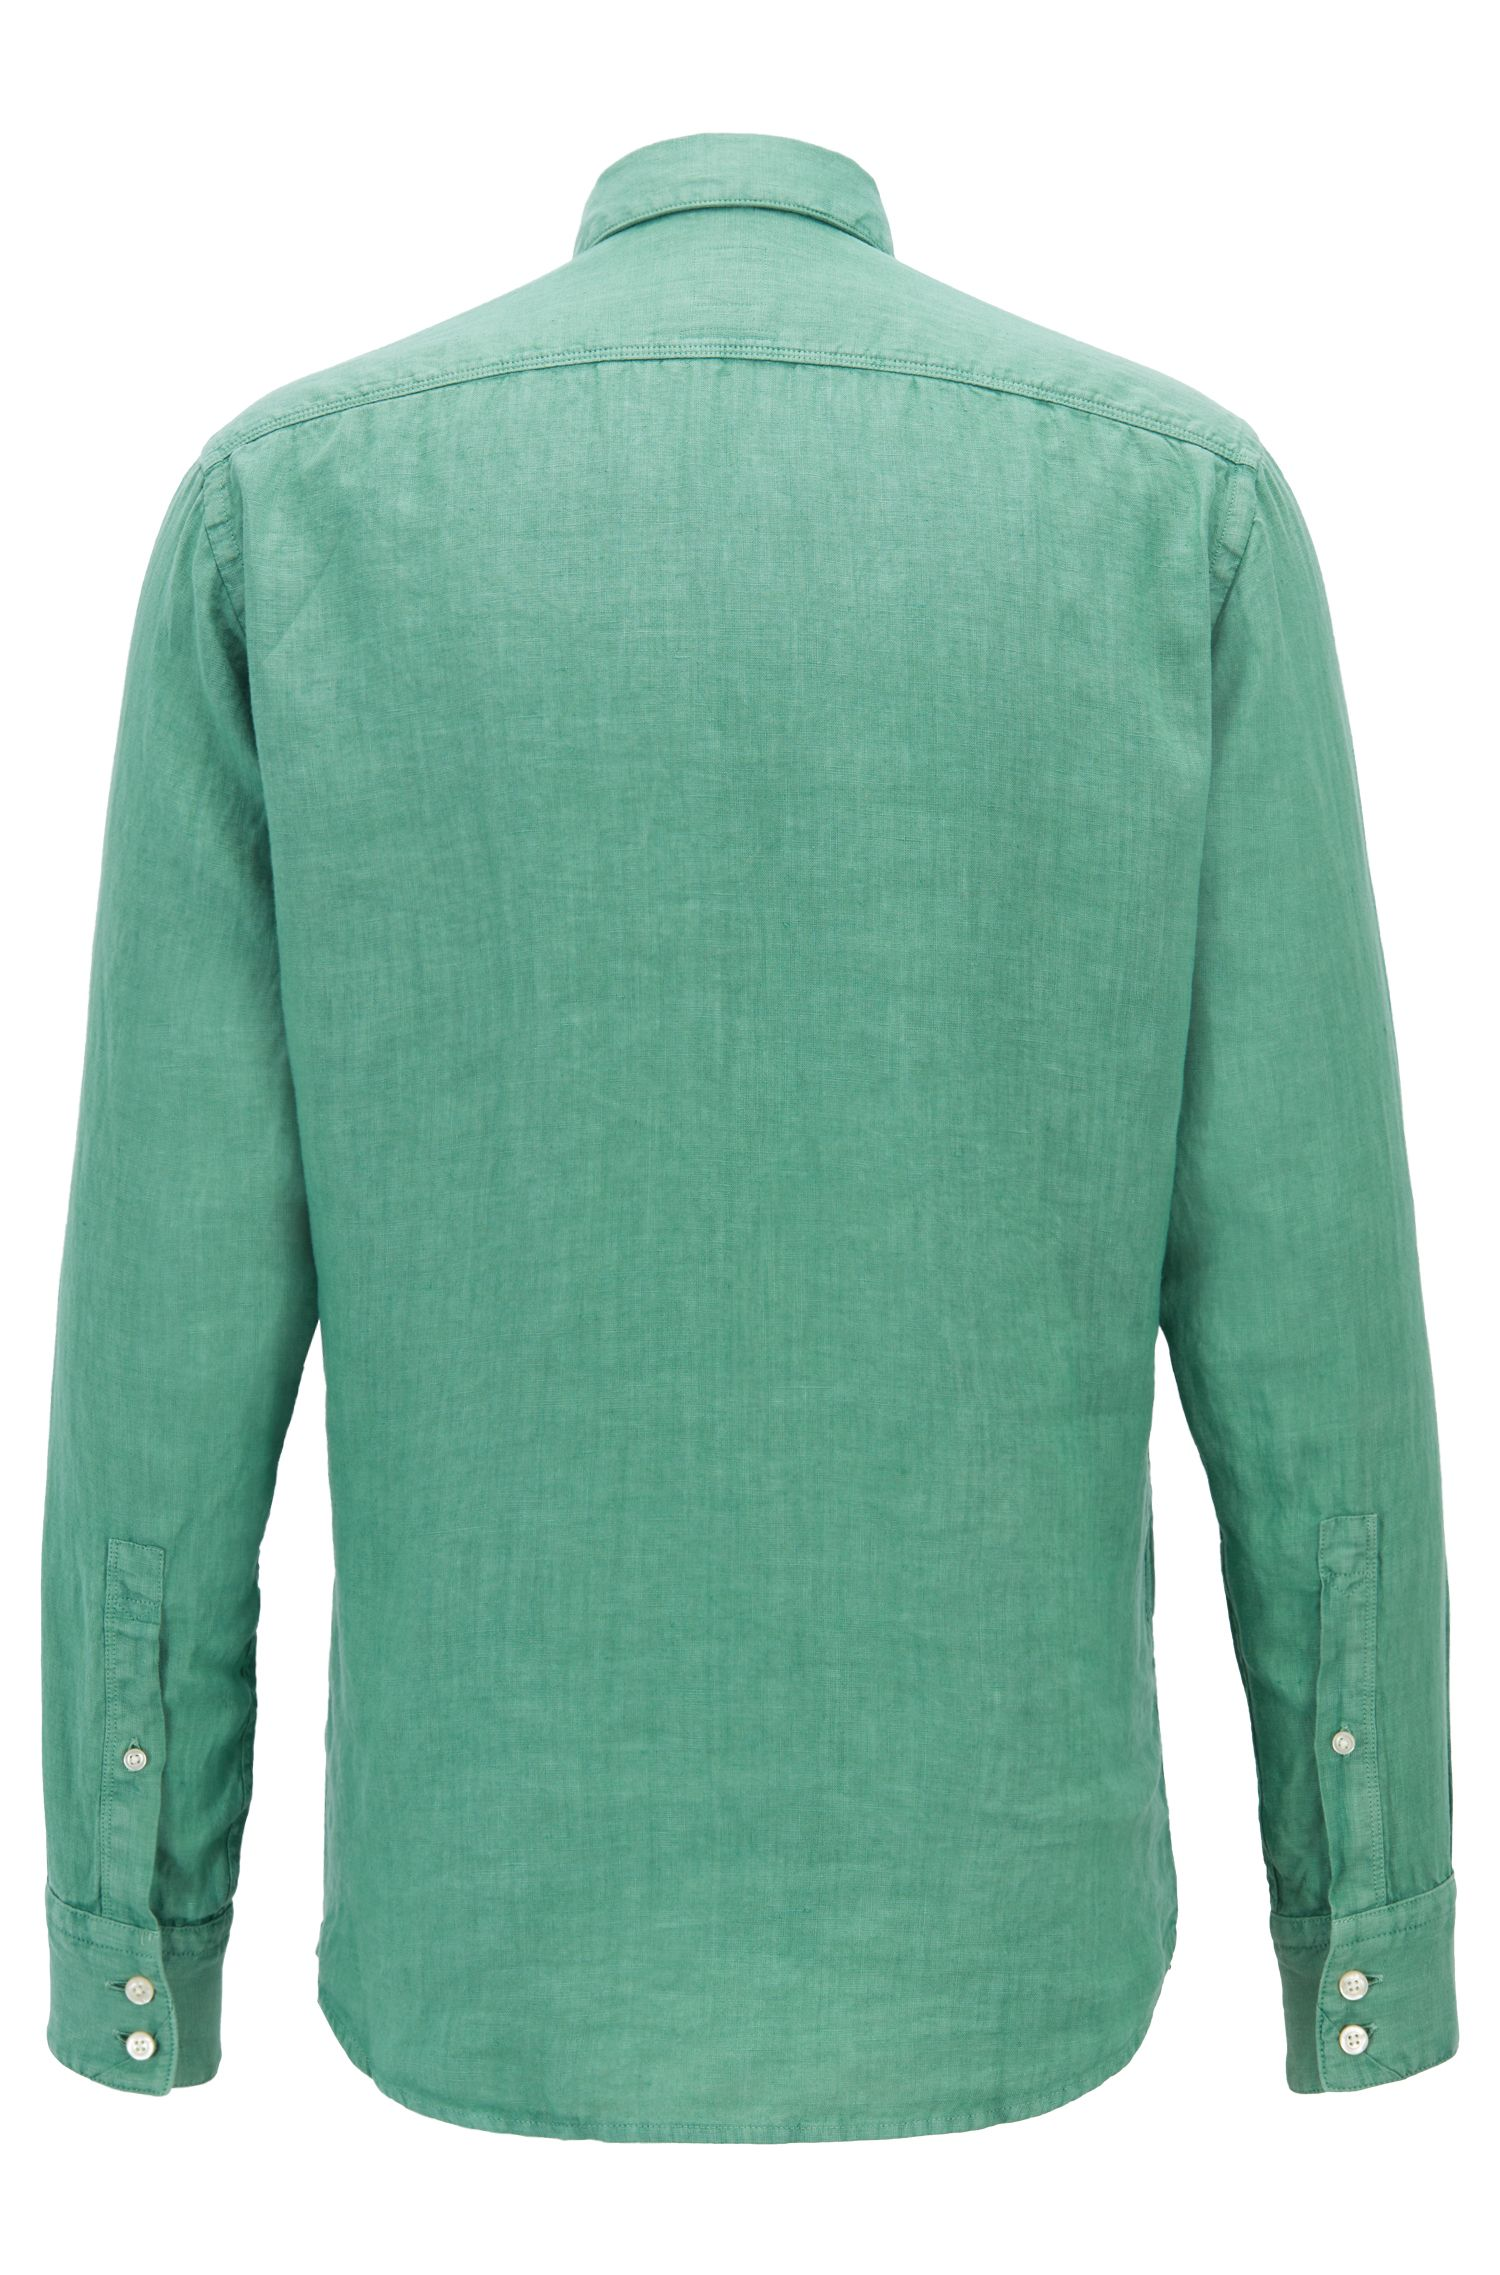 Regular-fit overhemd van pigment-dyed linnen popeline, Kalk